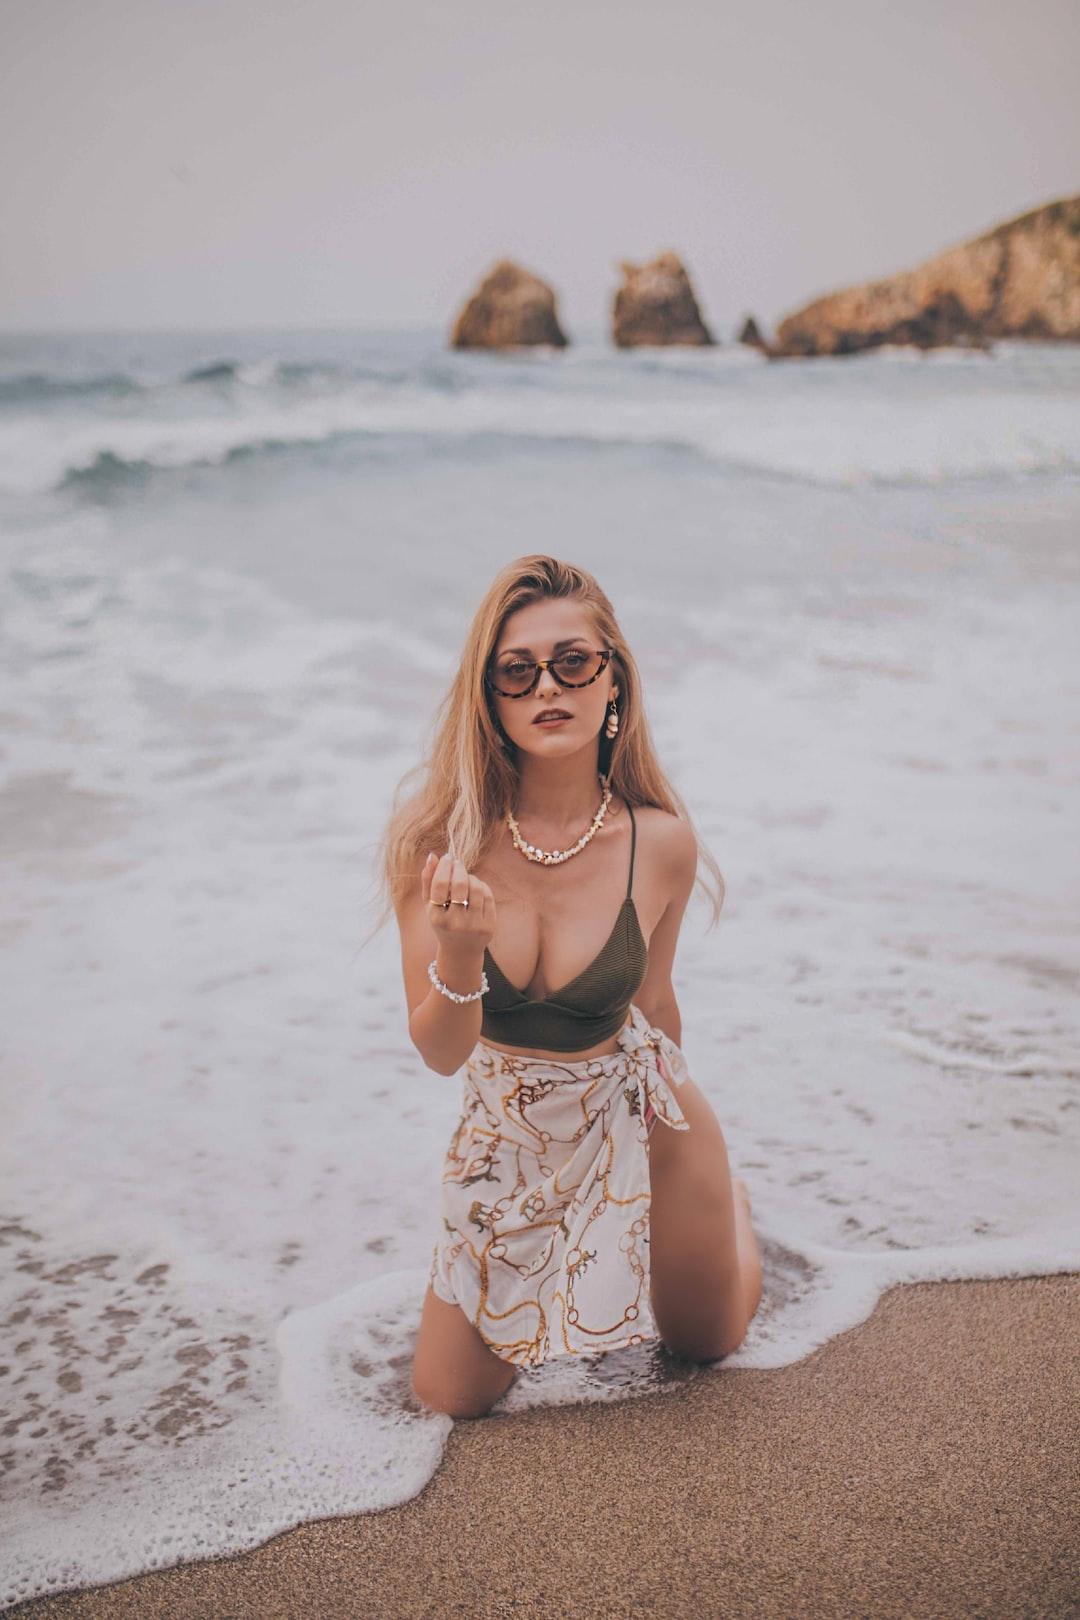 #bikini #beach #sea #wave #sand #sun #pendant jewelry bangle sunglasses summer warmth